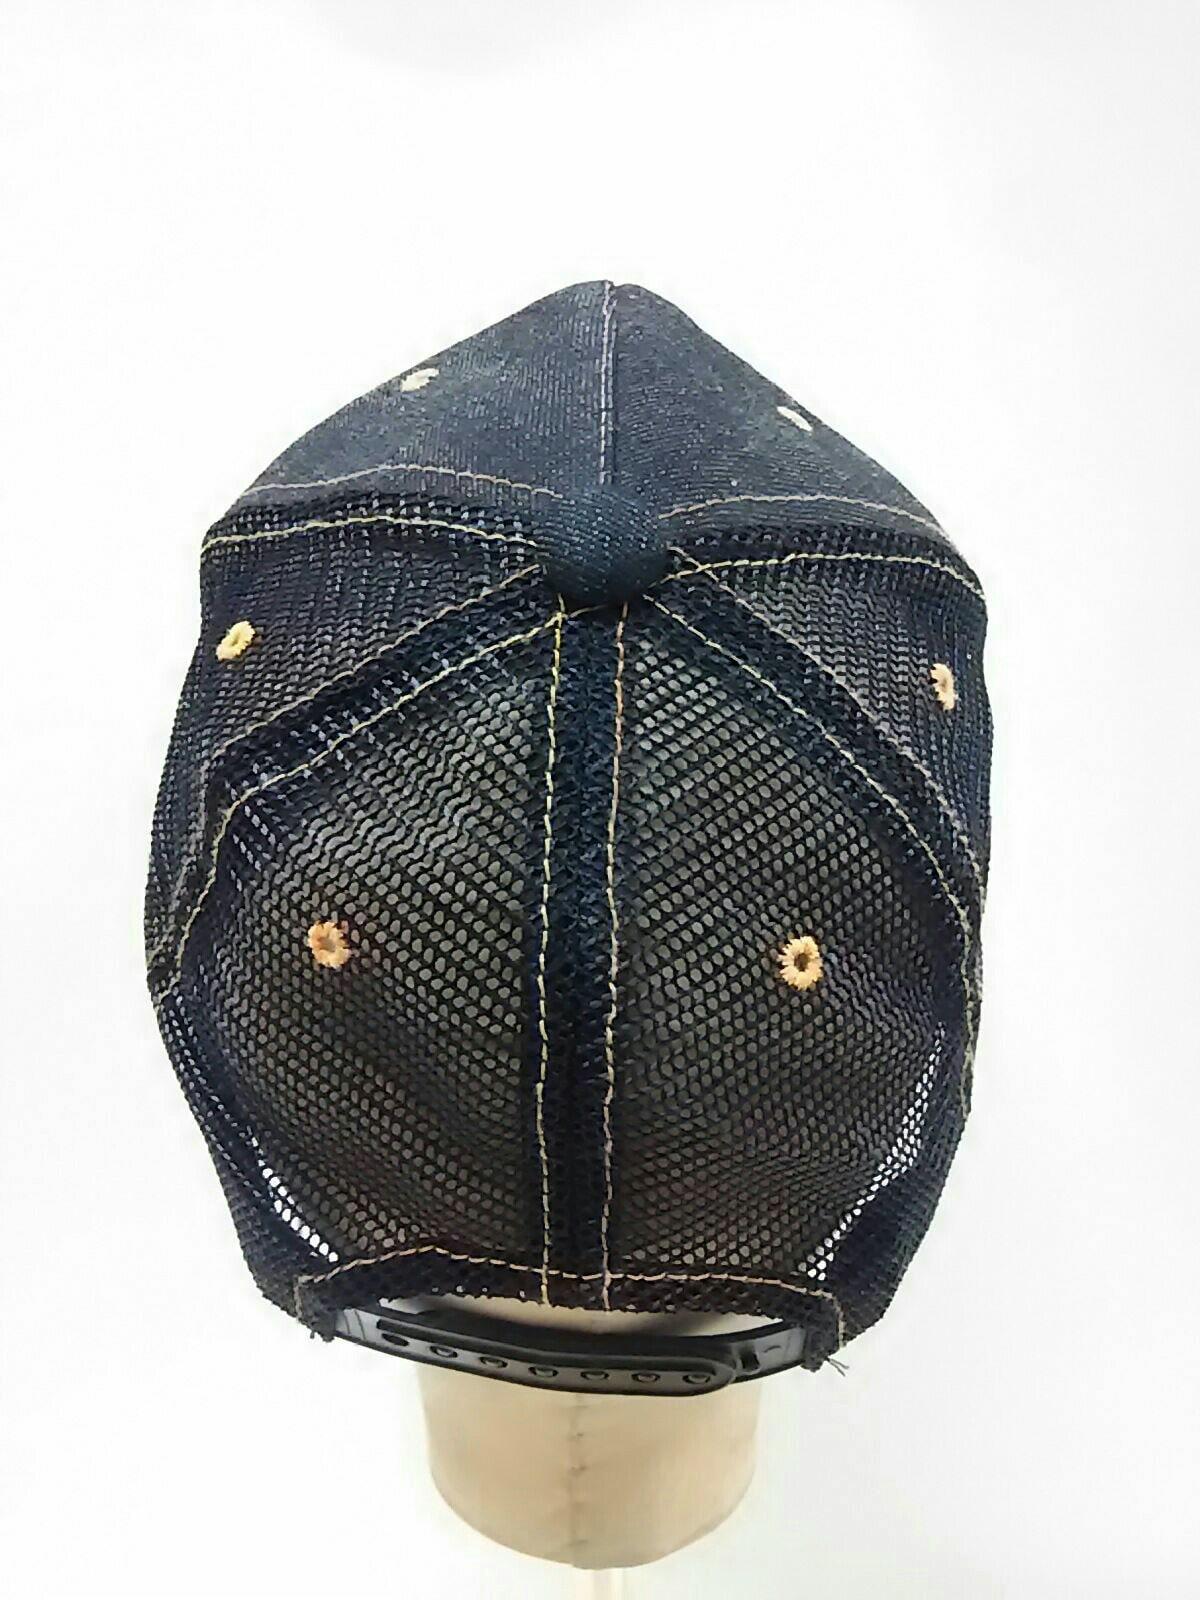 EVISU(エヴィス)の帽子